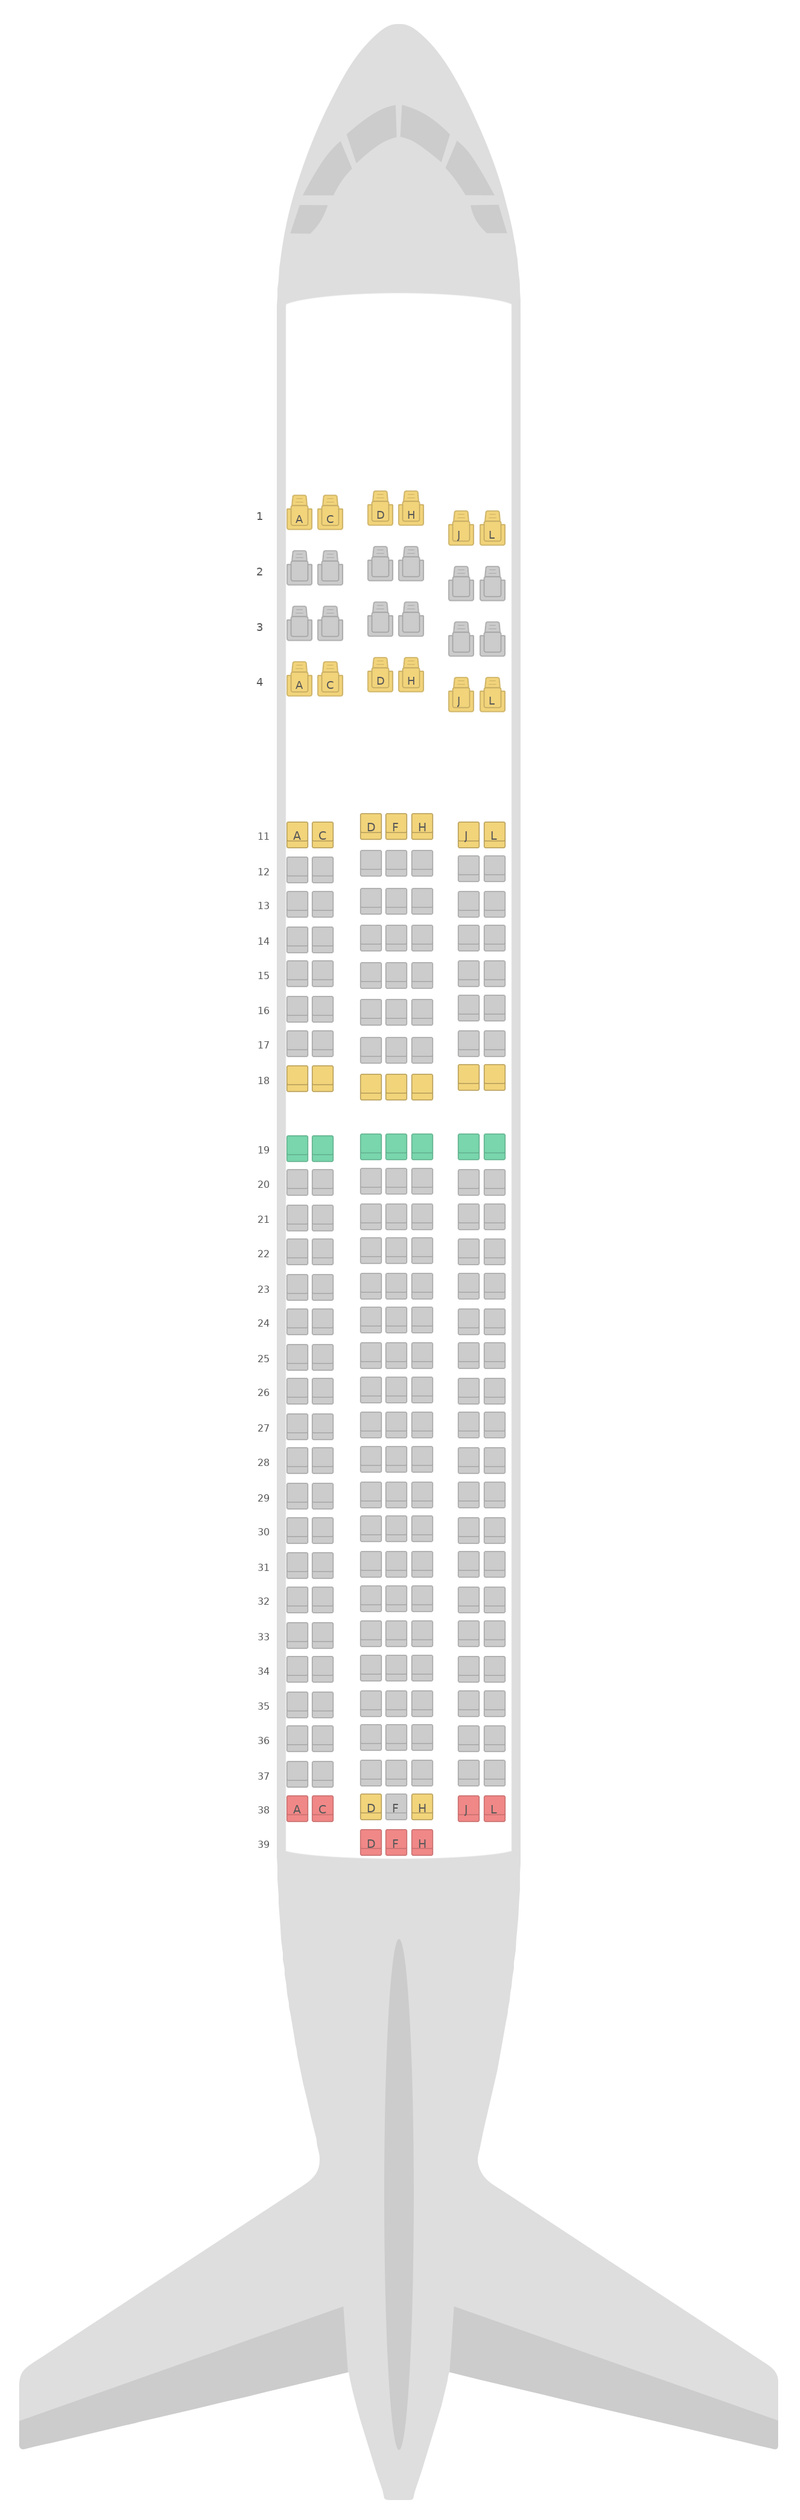 Seat Map Ethiopian Airlines Boeing 767-300ER